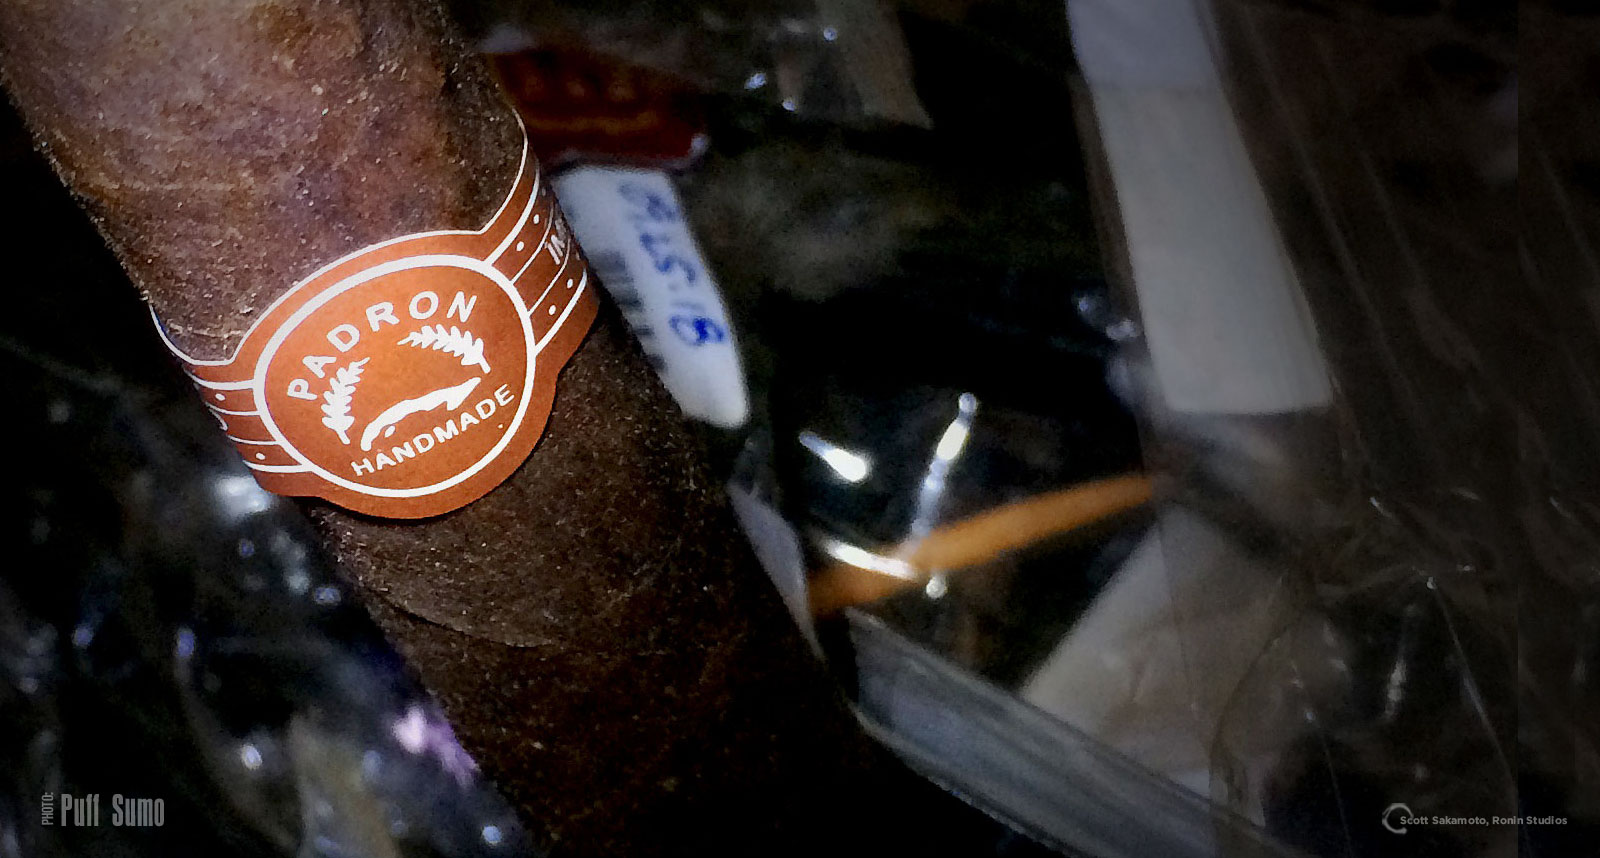 Padron Cigars, Padron Maduro, Padron Thousand Series